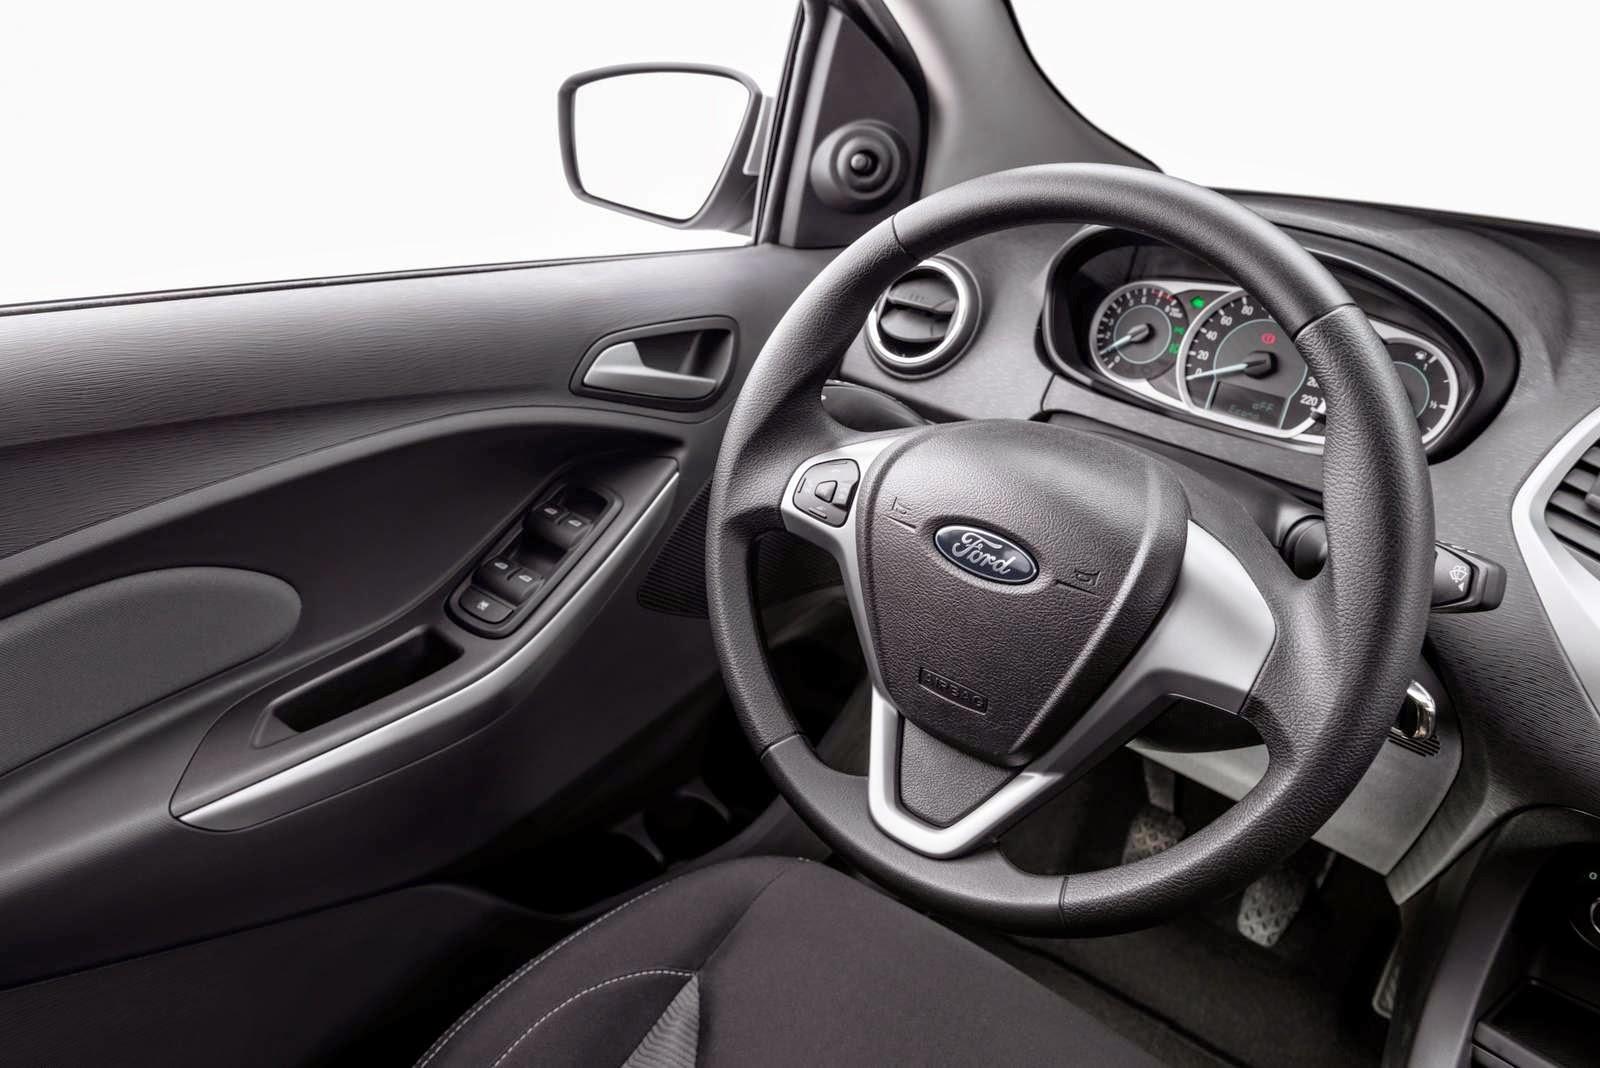 Novo Ford Ka interior 2015